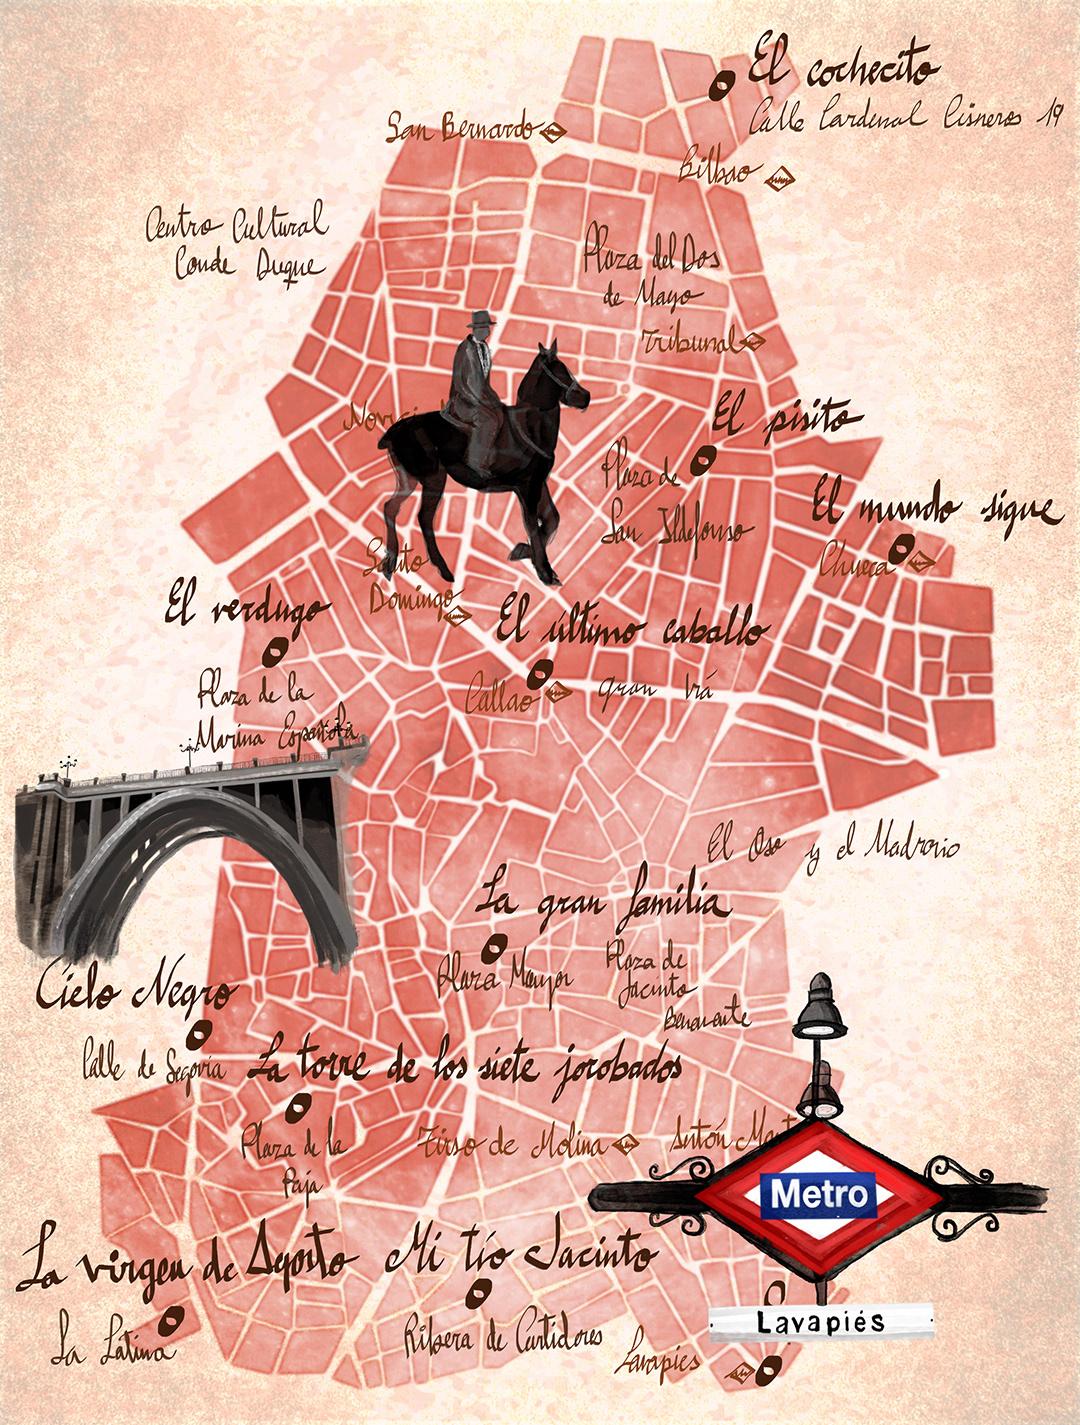 mapa creativo mapas photoshop ilustración editorial publishing   ILLUSTRATION  Creative Maps editorial magazine